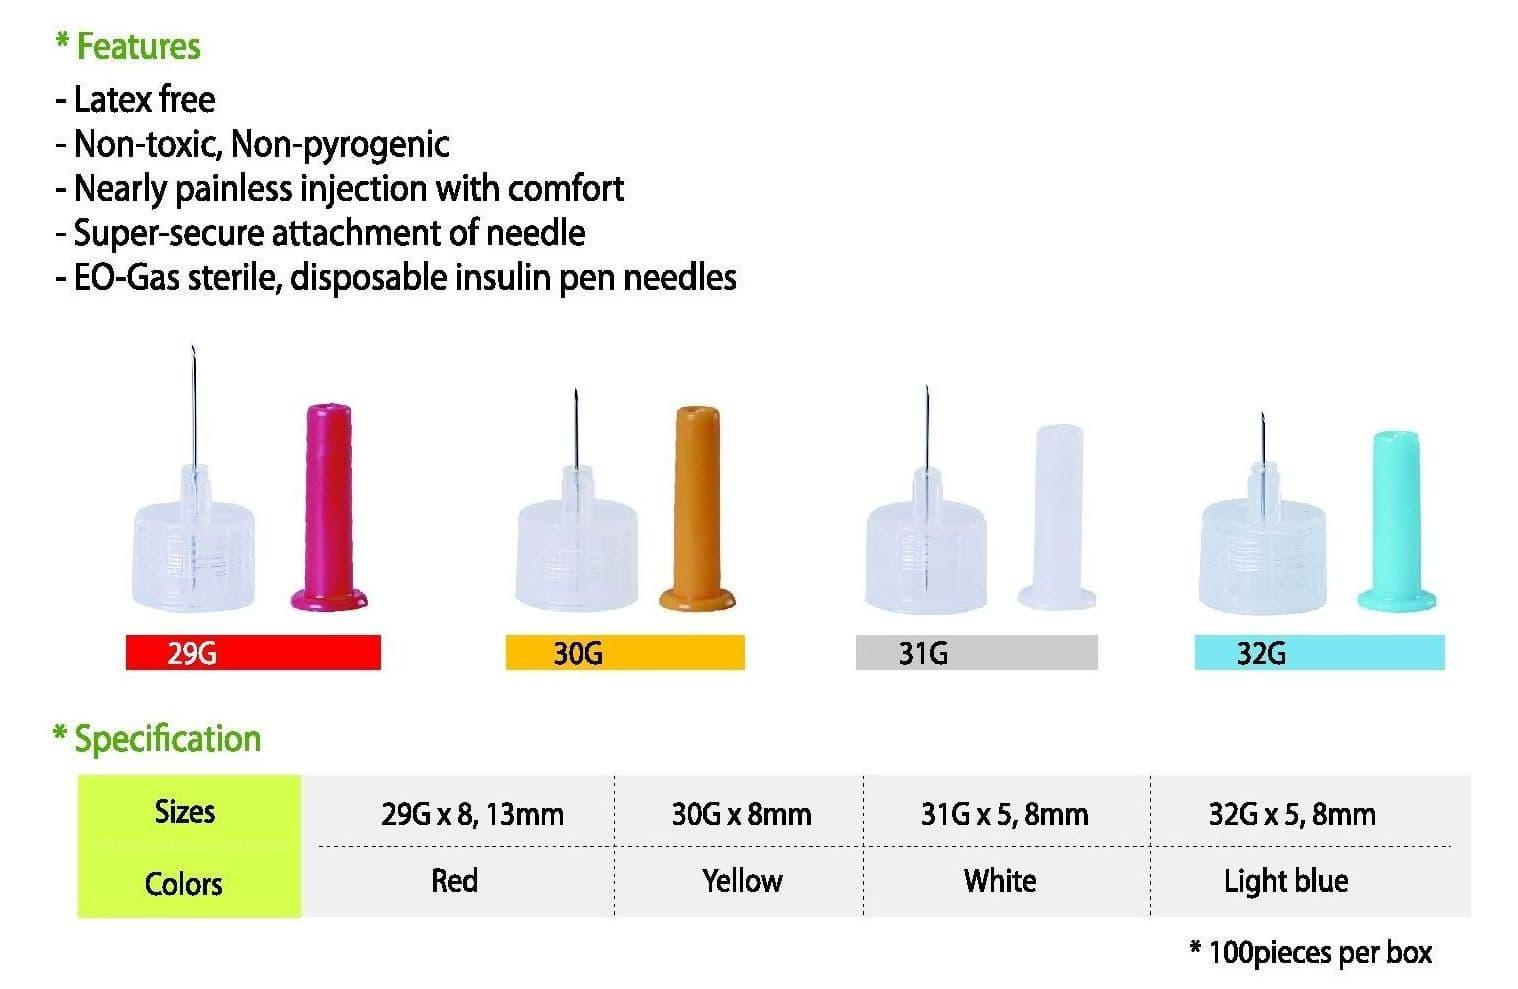 catheter size chart